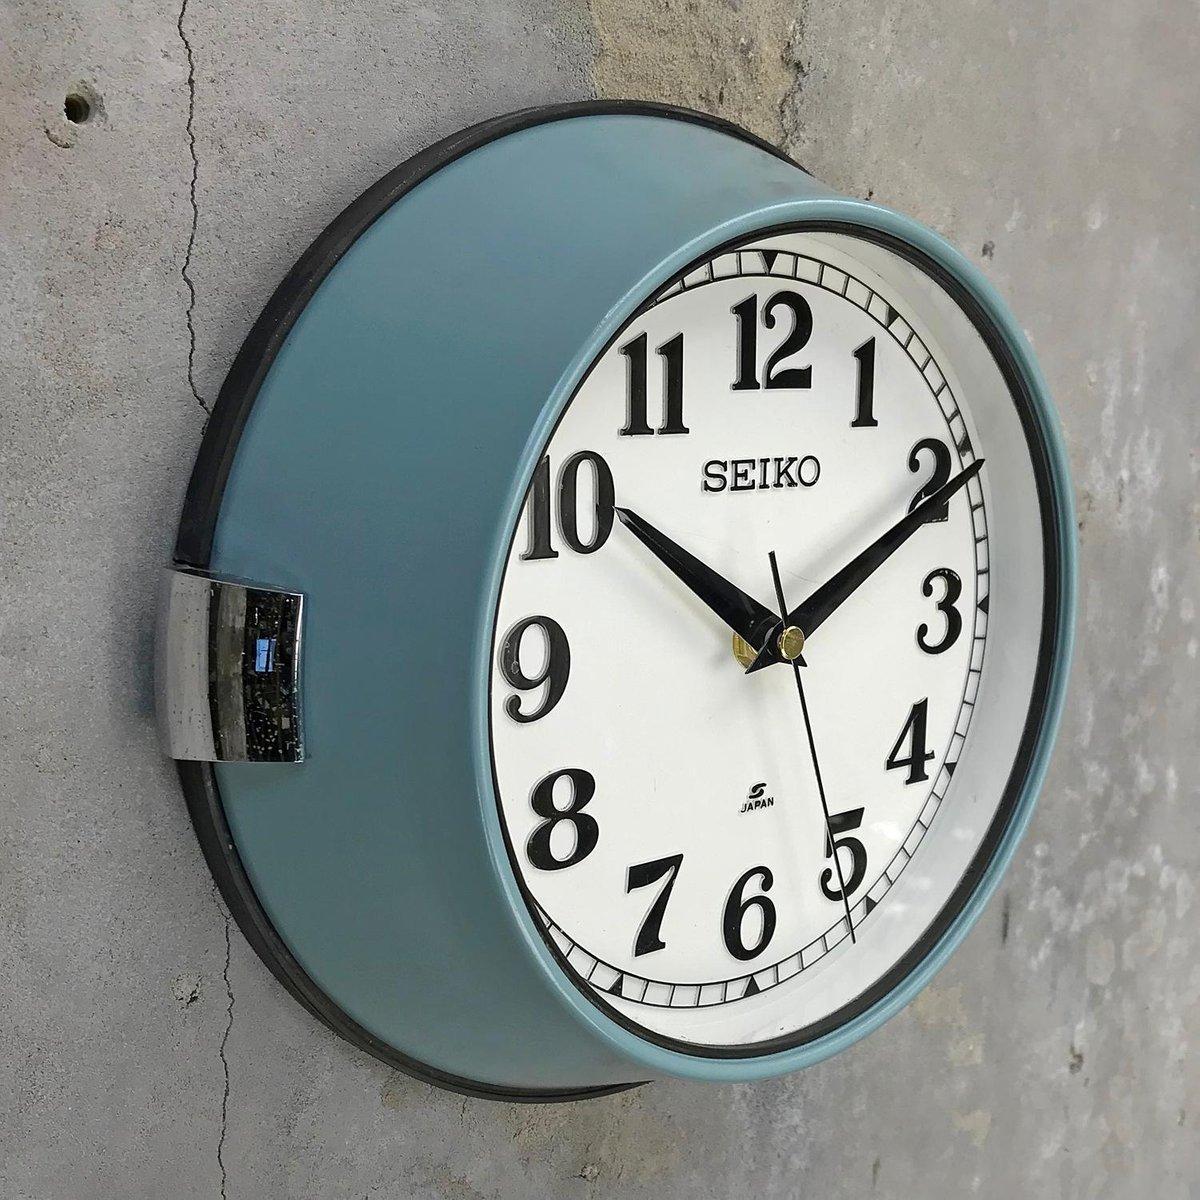 Vintage Industrial Steel Quartz Wall Clock From Seiko